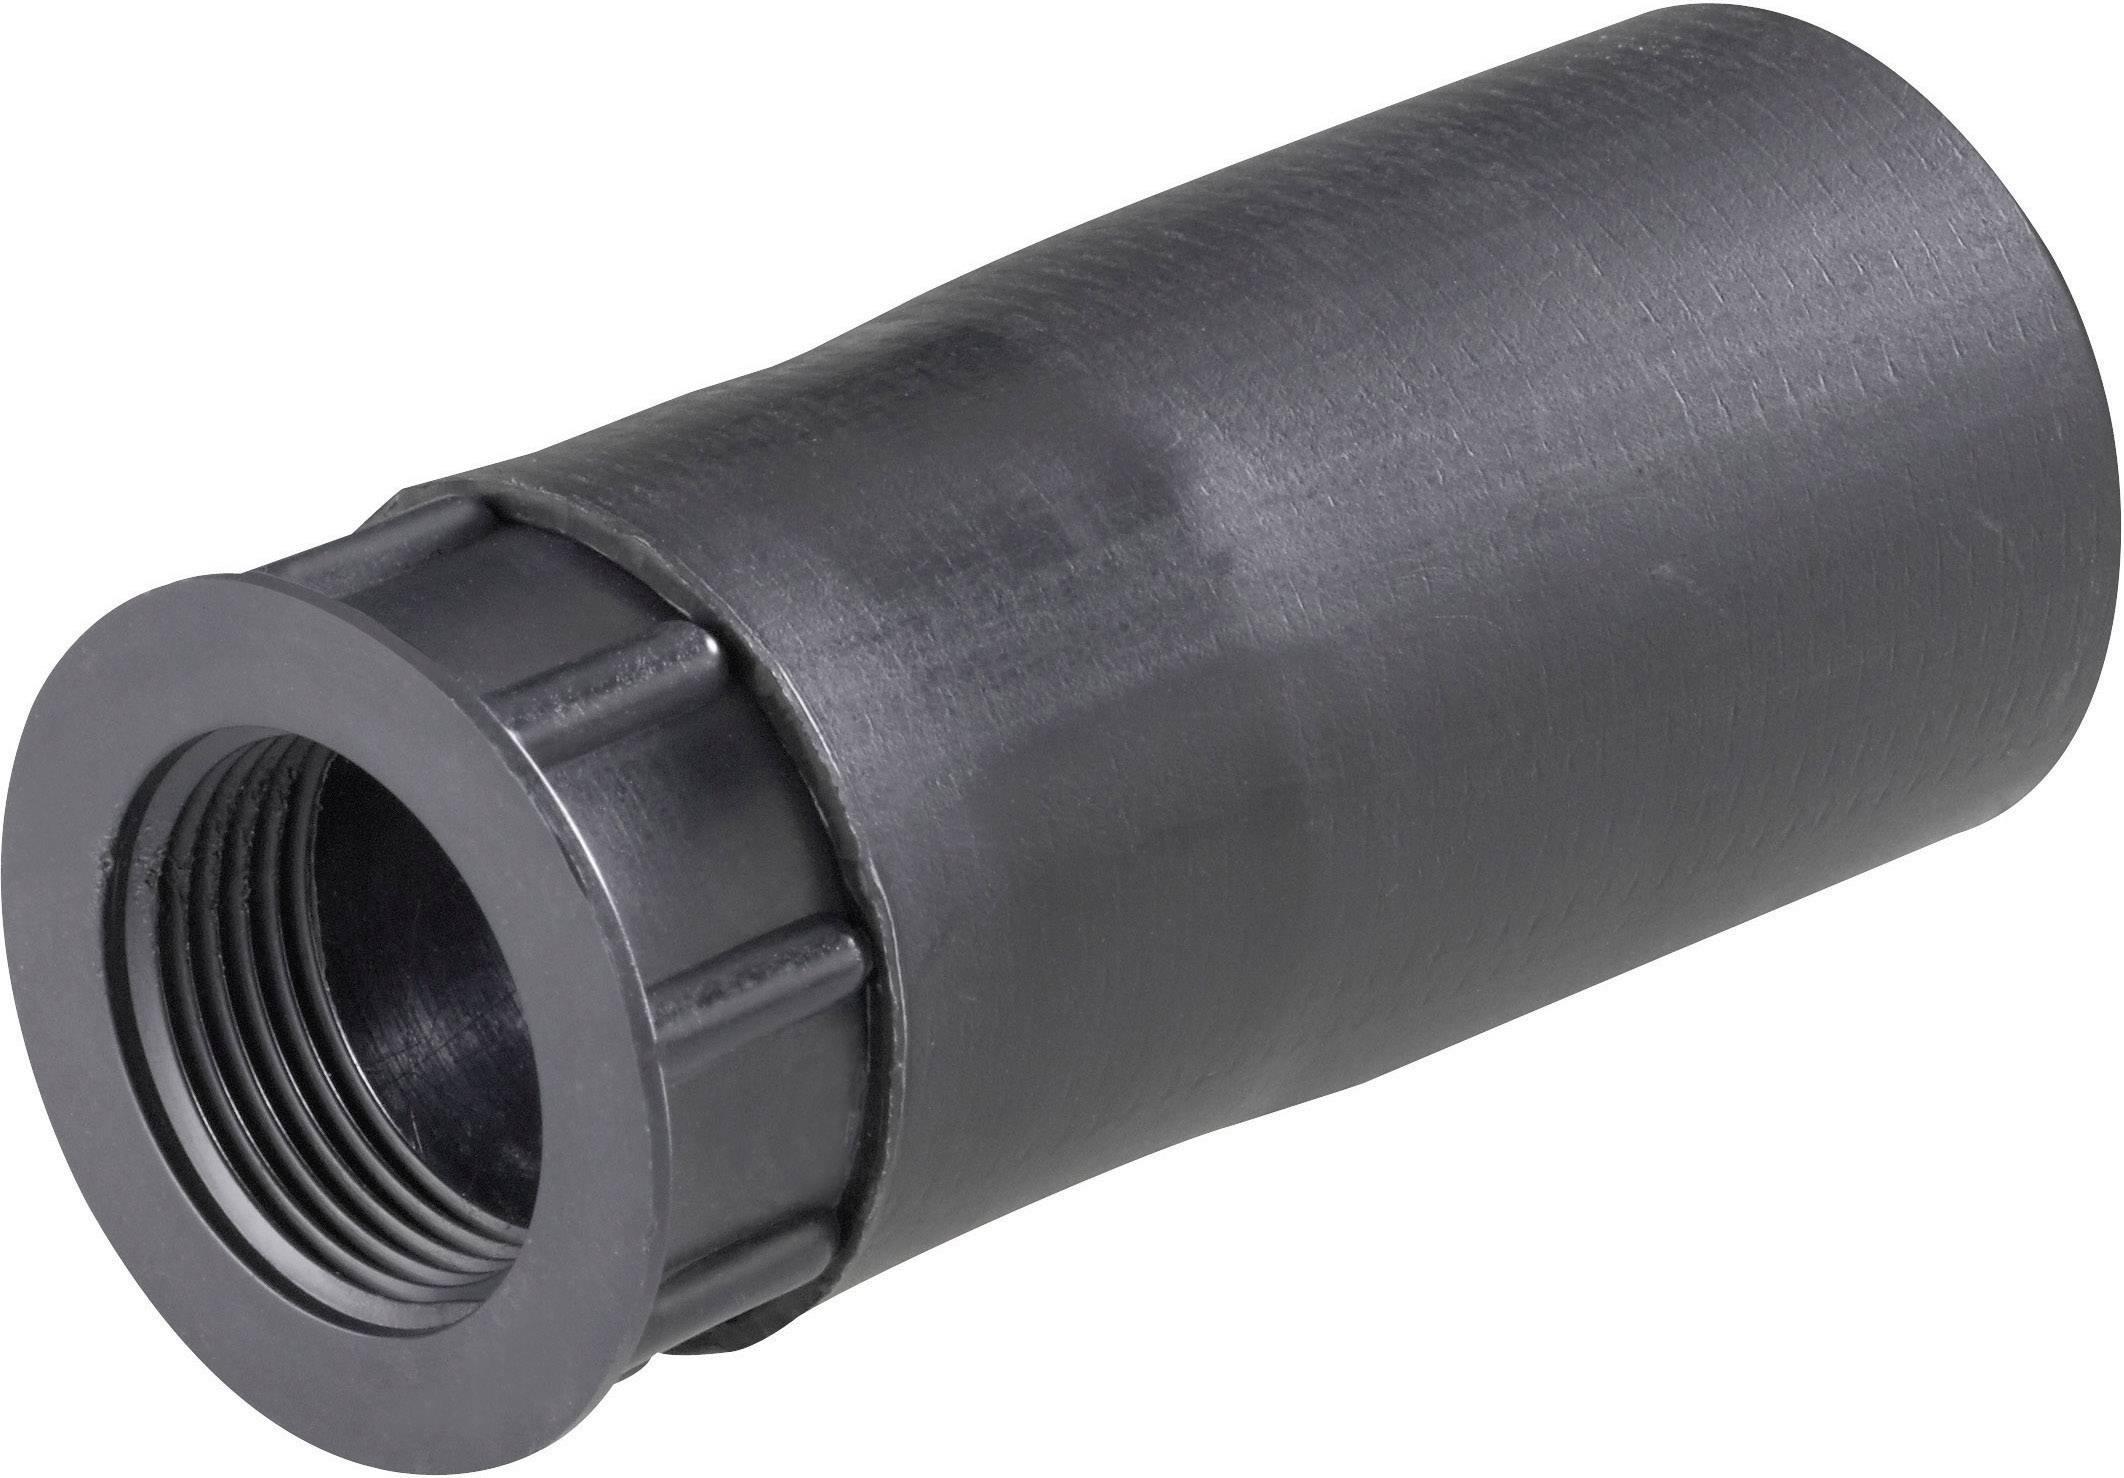 CPC, PRUCHODKA PRO KABELOVÝIII+0,20-0,56mm2,24-20AWG